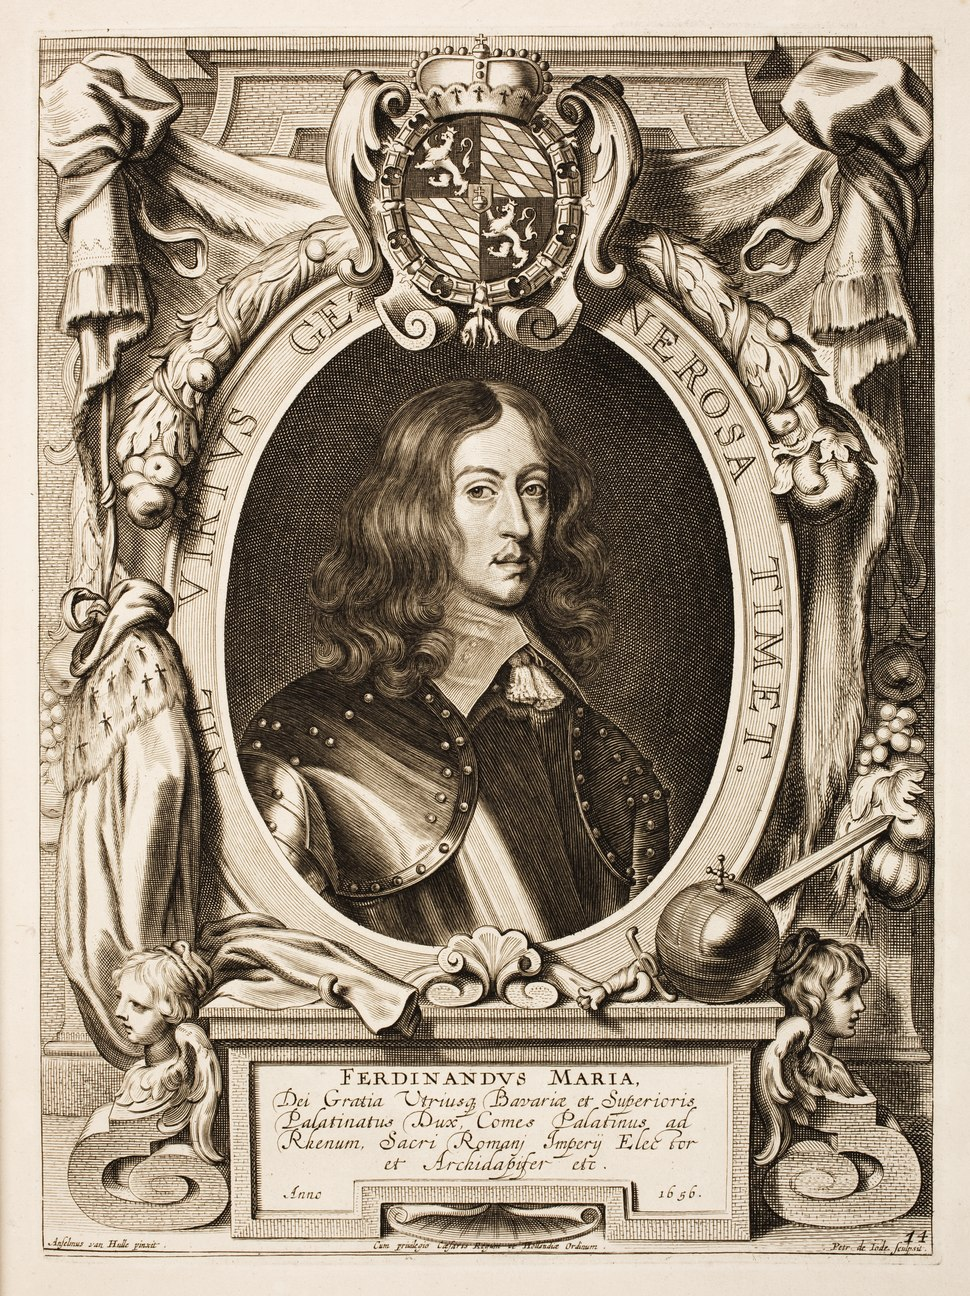 Anselmus-van-Hulle-Hommes-illustres MG 0441